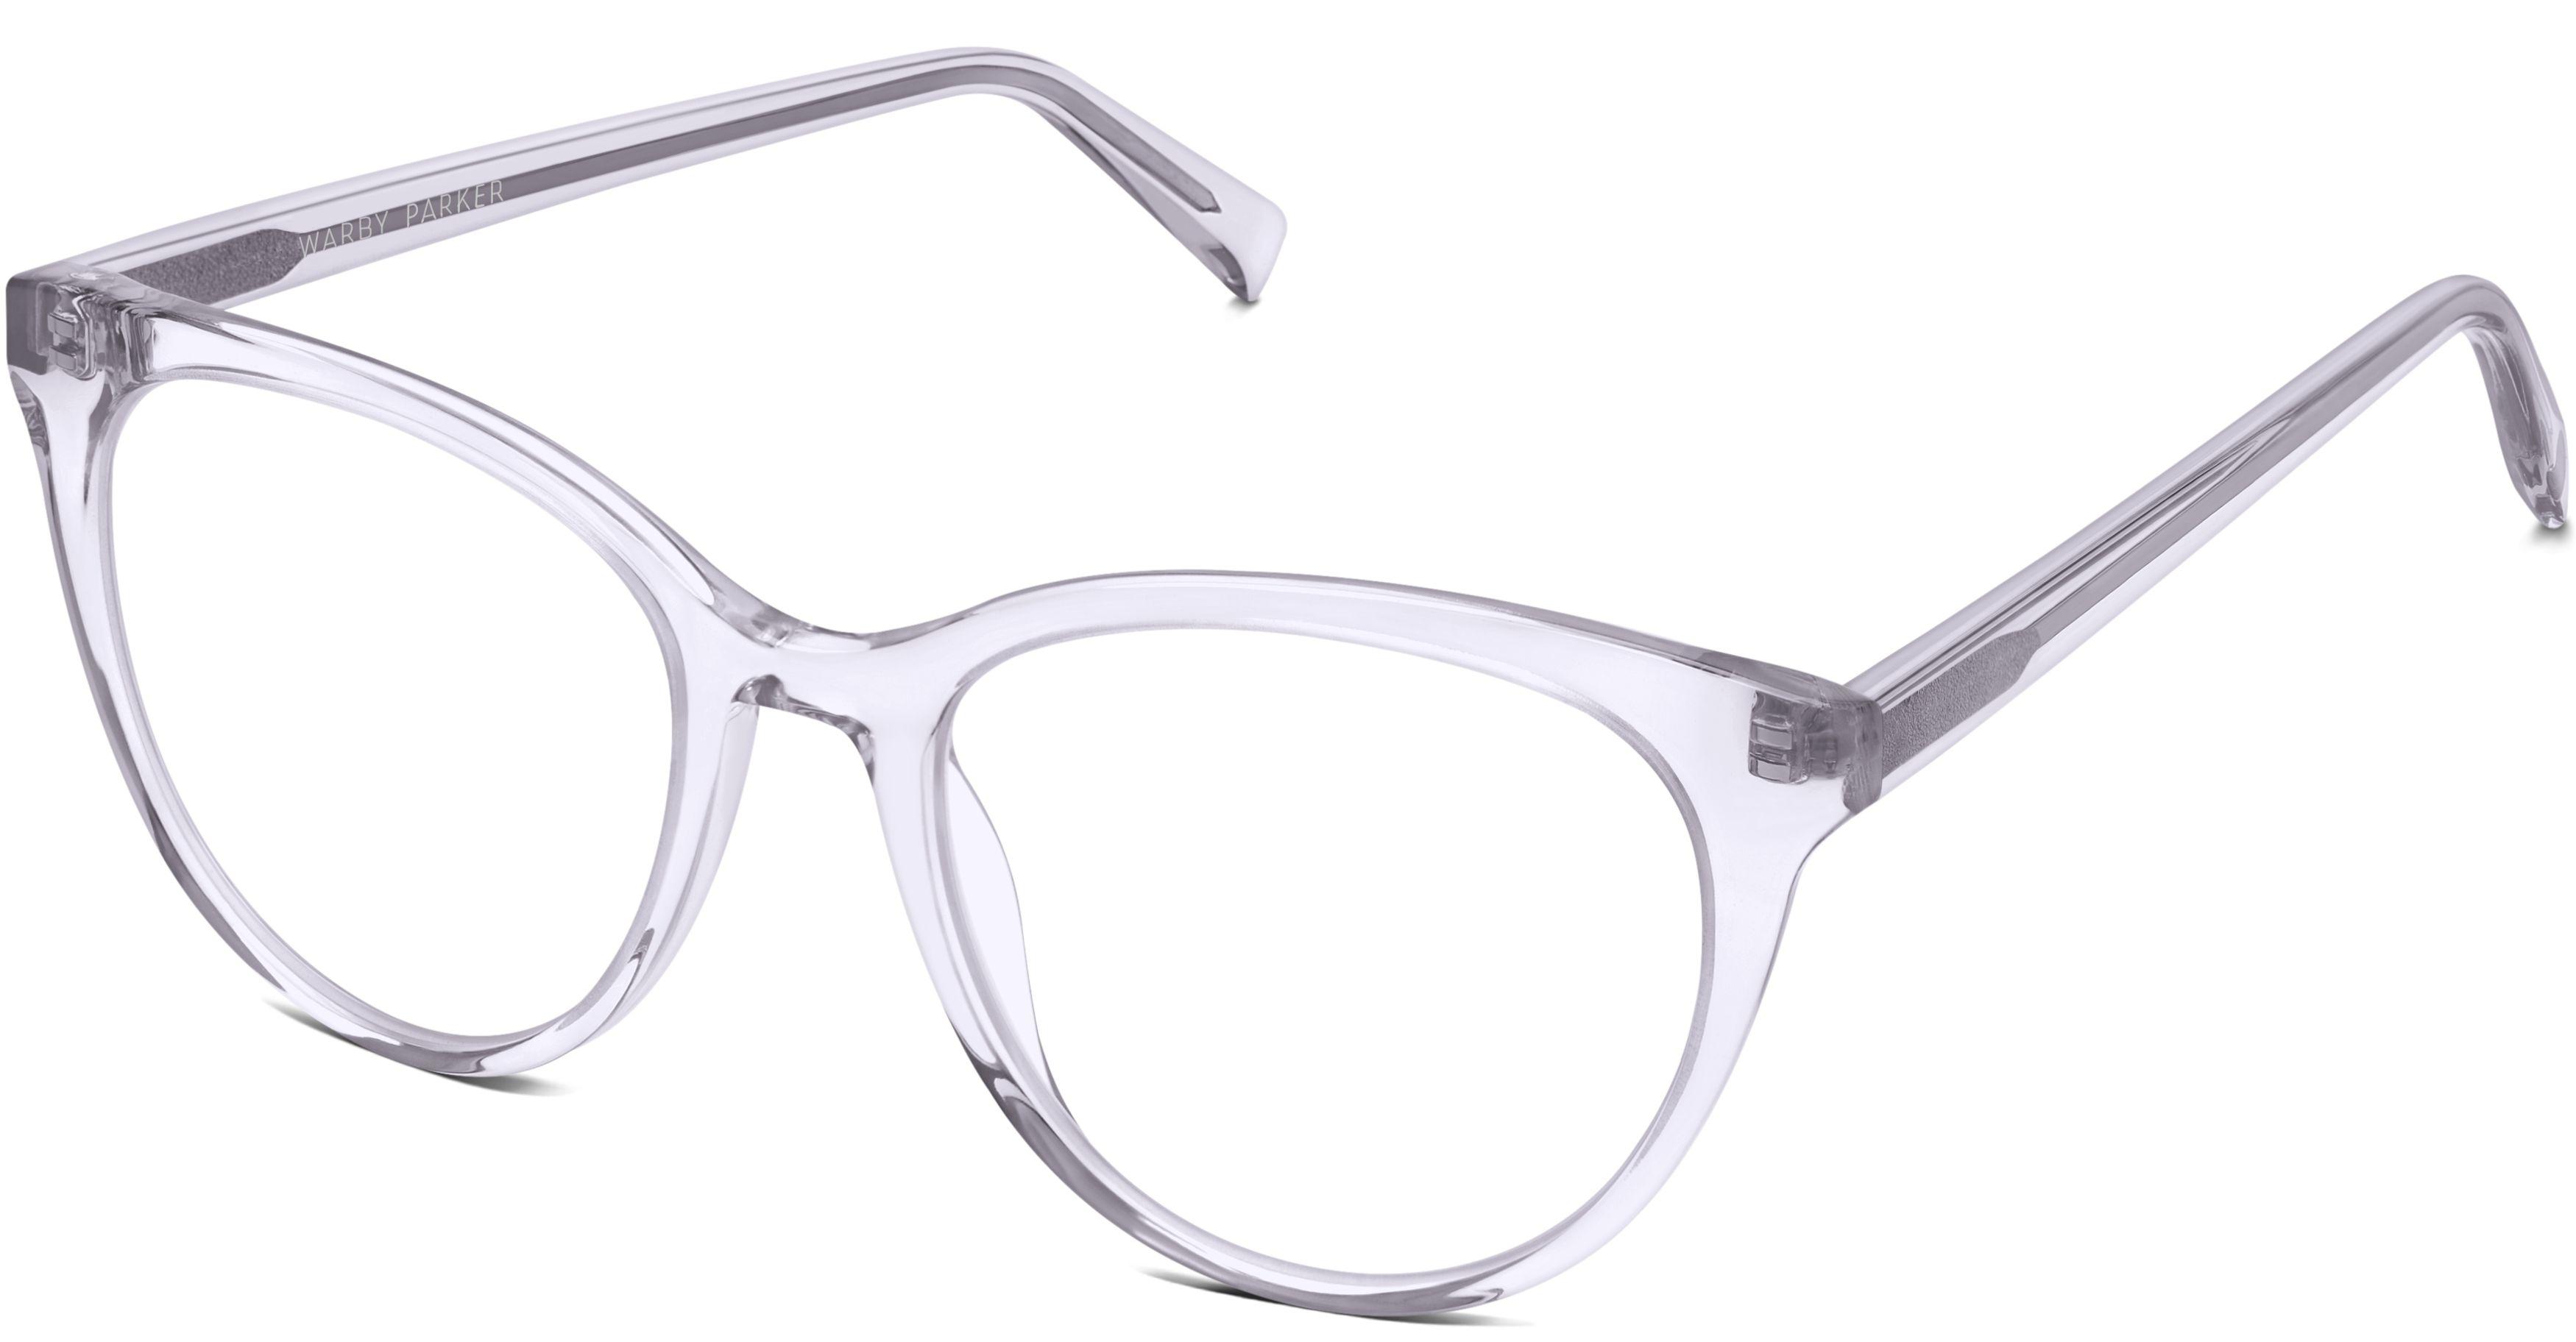 8f4f448e2b Haley Eyeglasses in Lavender Crystal for Women